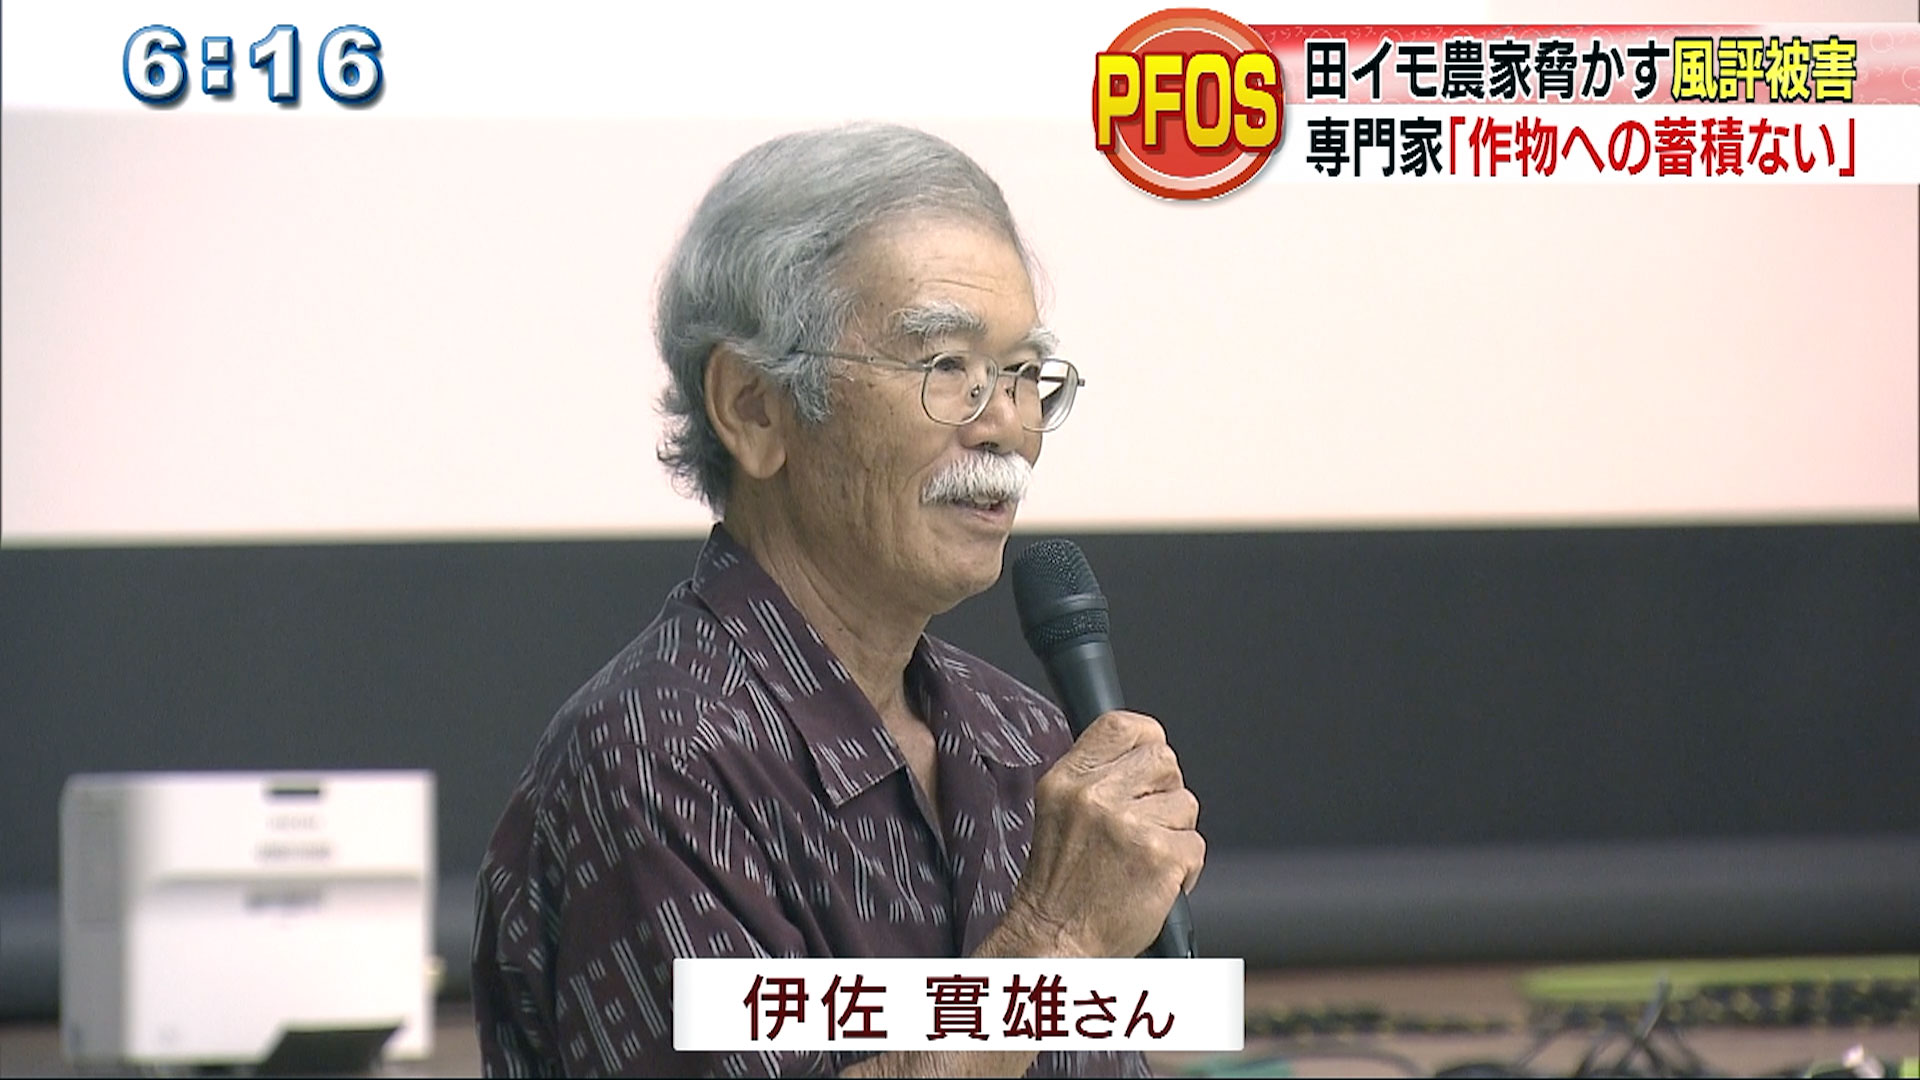 PFOS 田イモ農家脅かす風評被害